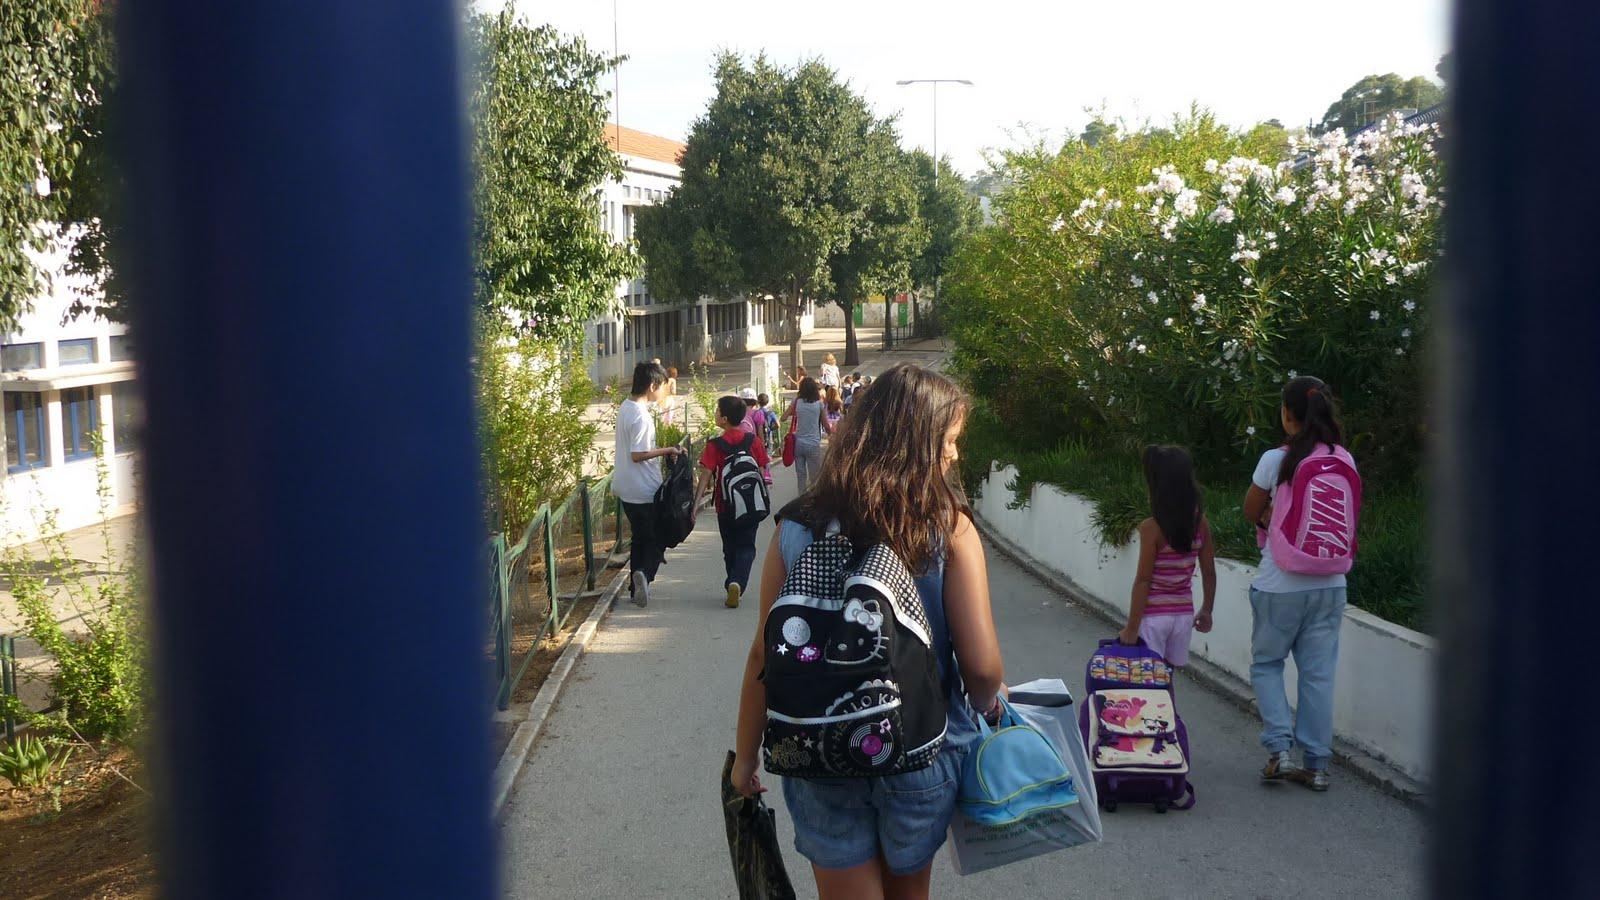 Iniciou o Ano Escolar 2010 11 no Bairro da Boavista (Lisboa) 02057979f8d8c